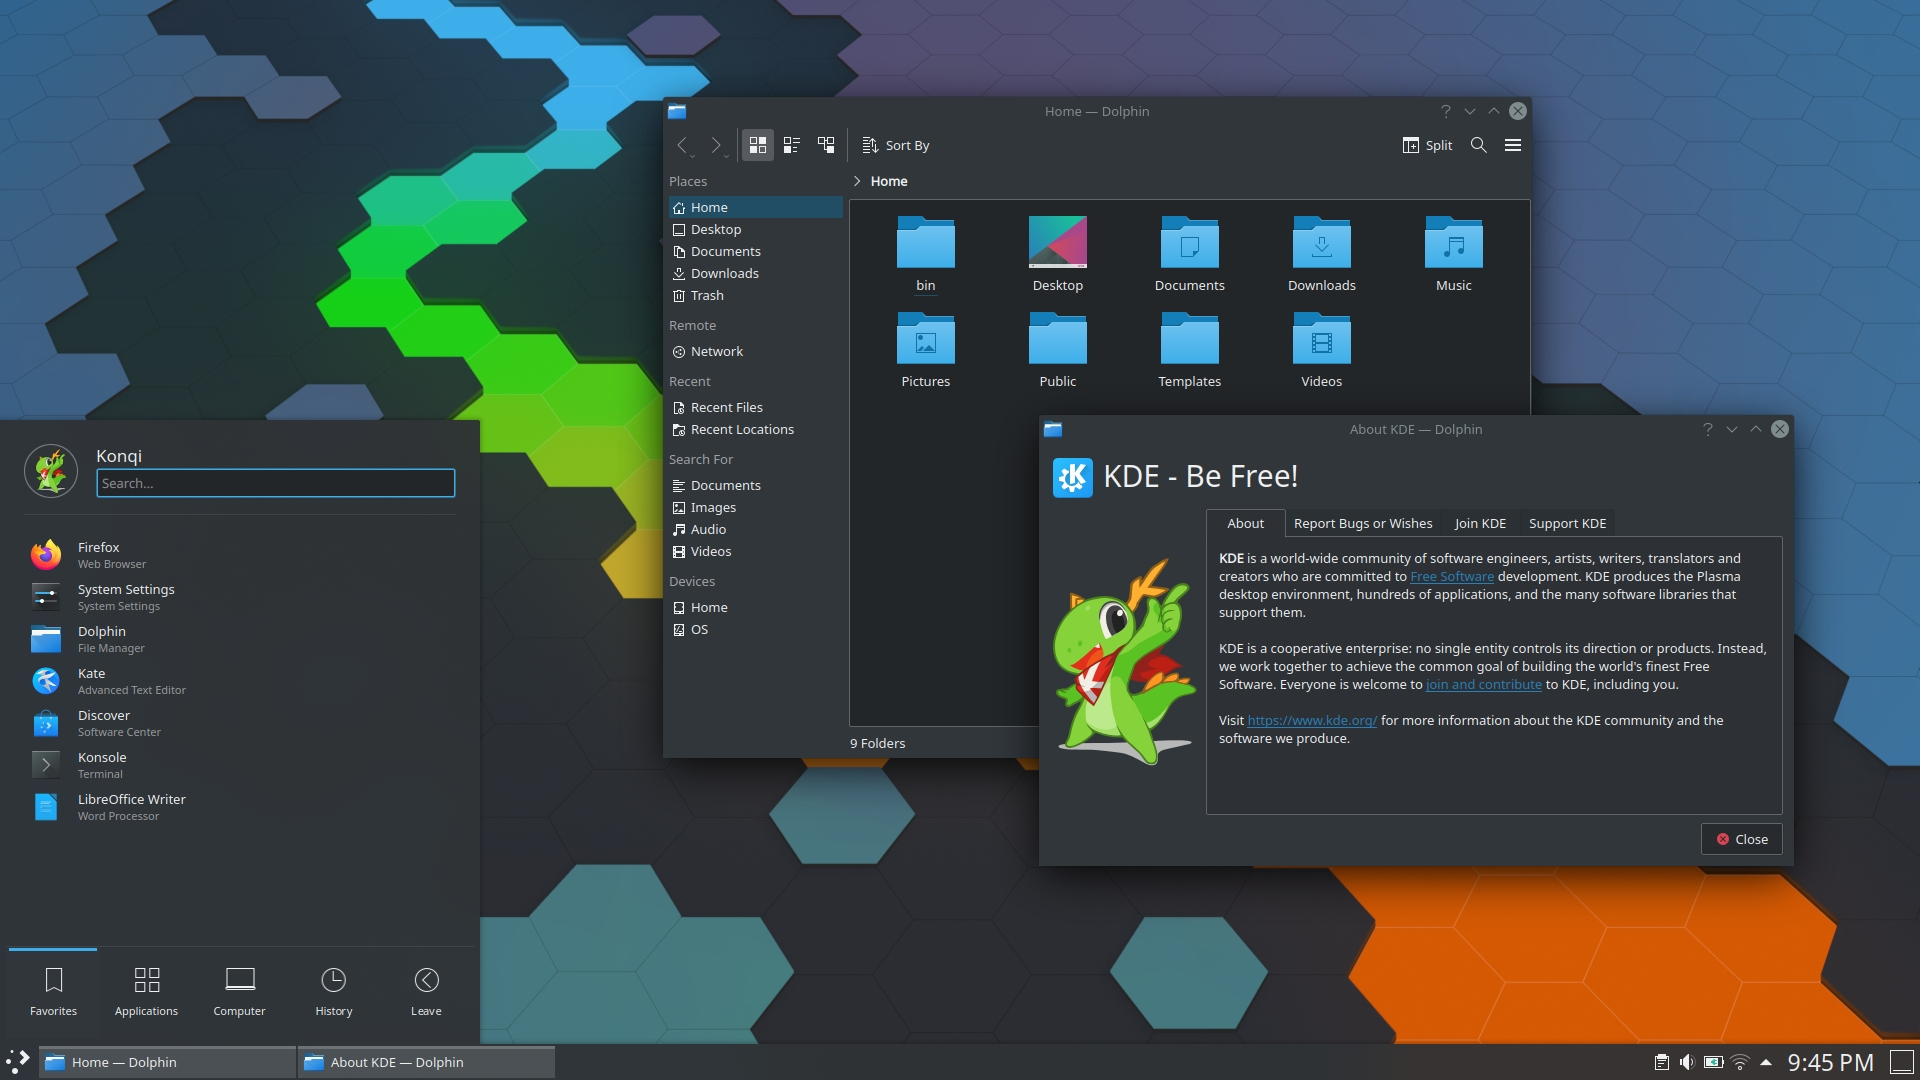 lookandfeel.dark/contents/previews/fullscreenpreview.jpg